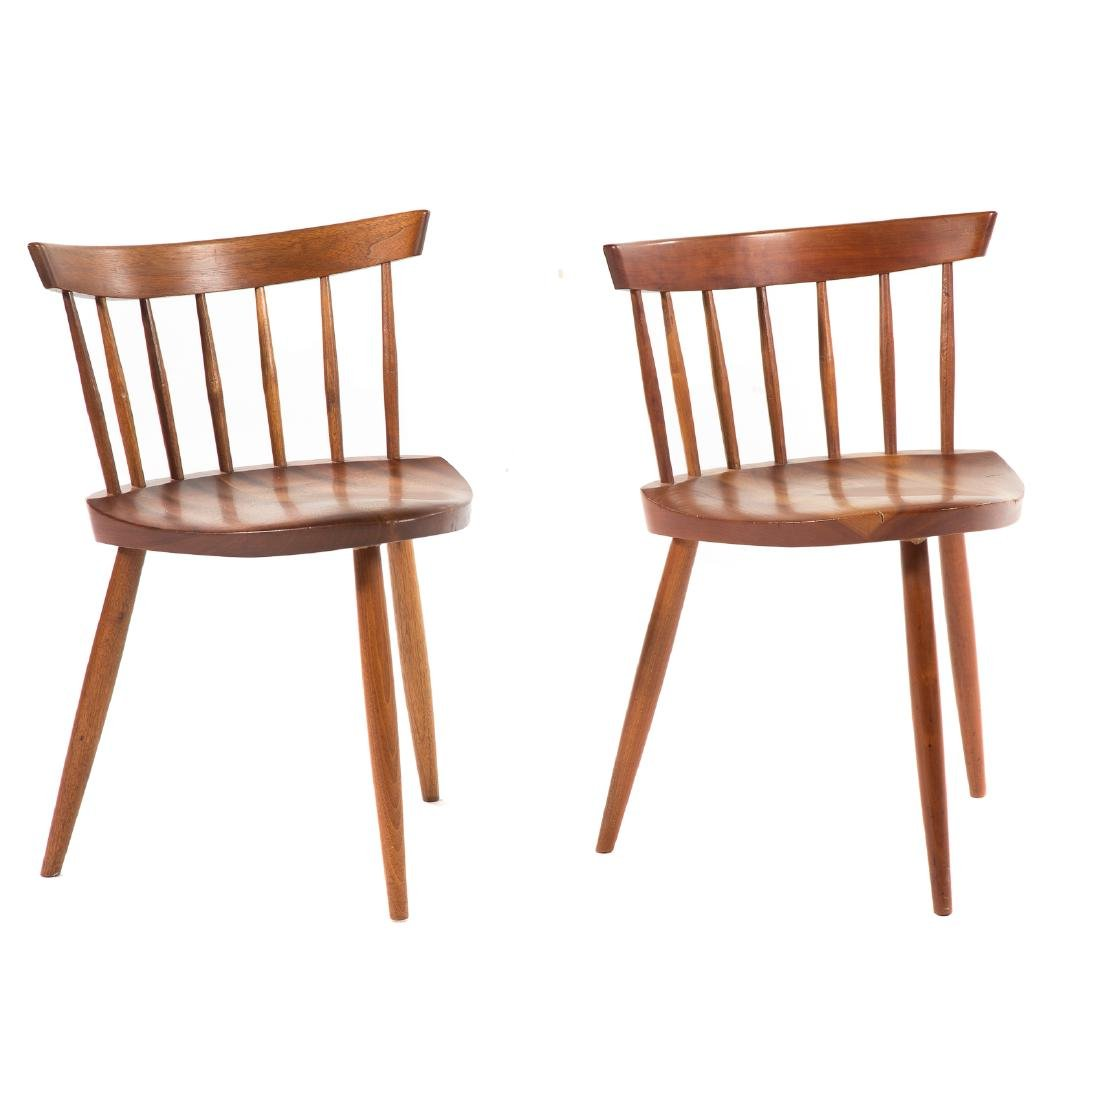 Two George Nakashima Mira Chairs - 4